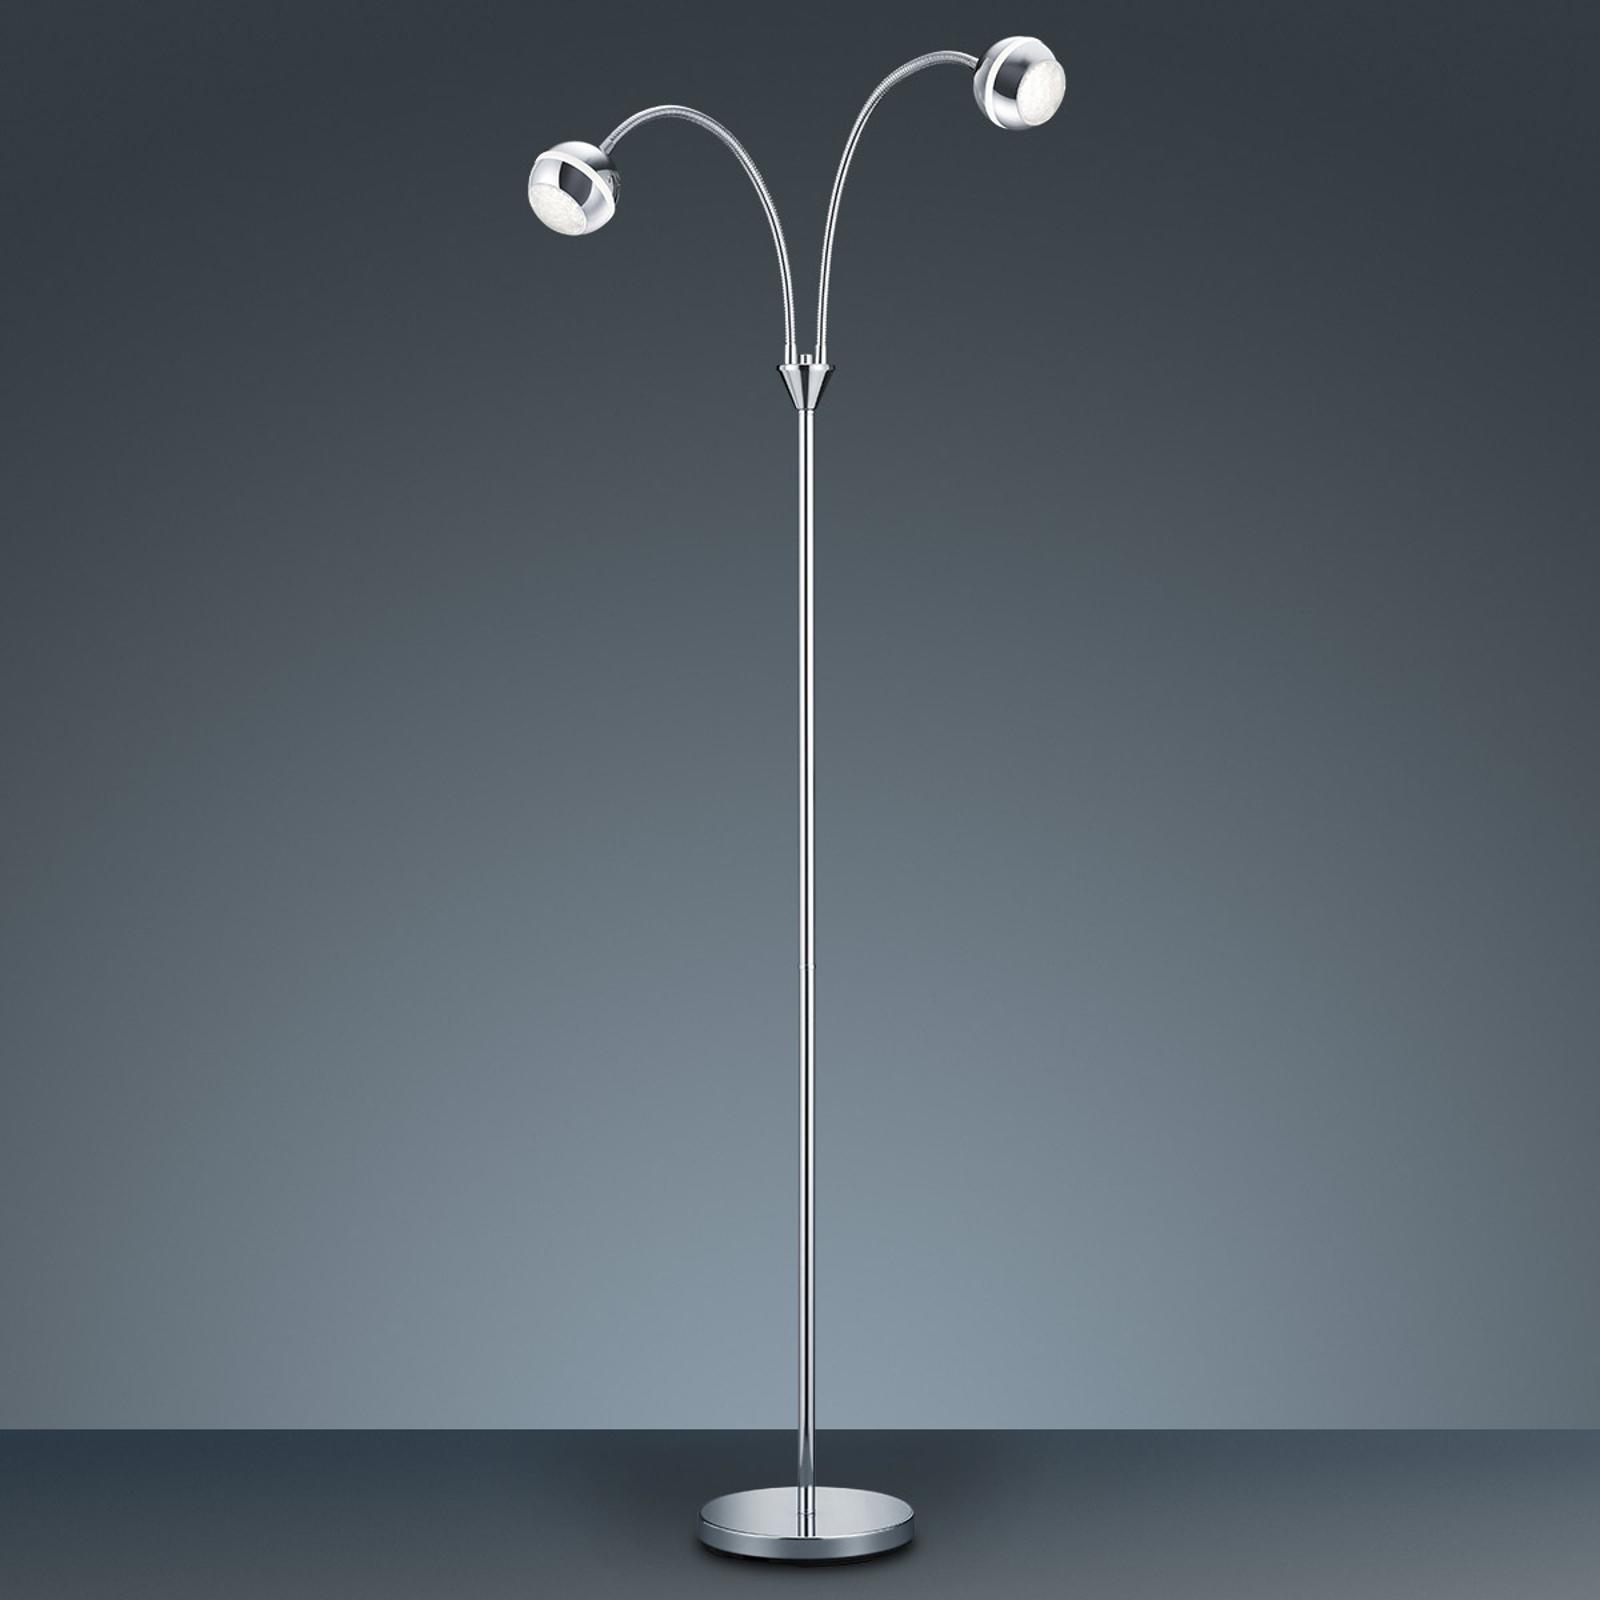 Dwupunktowa lampa stojąca LED Ada